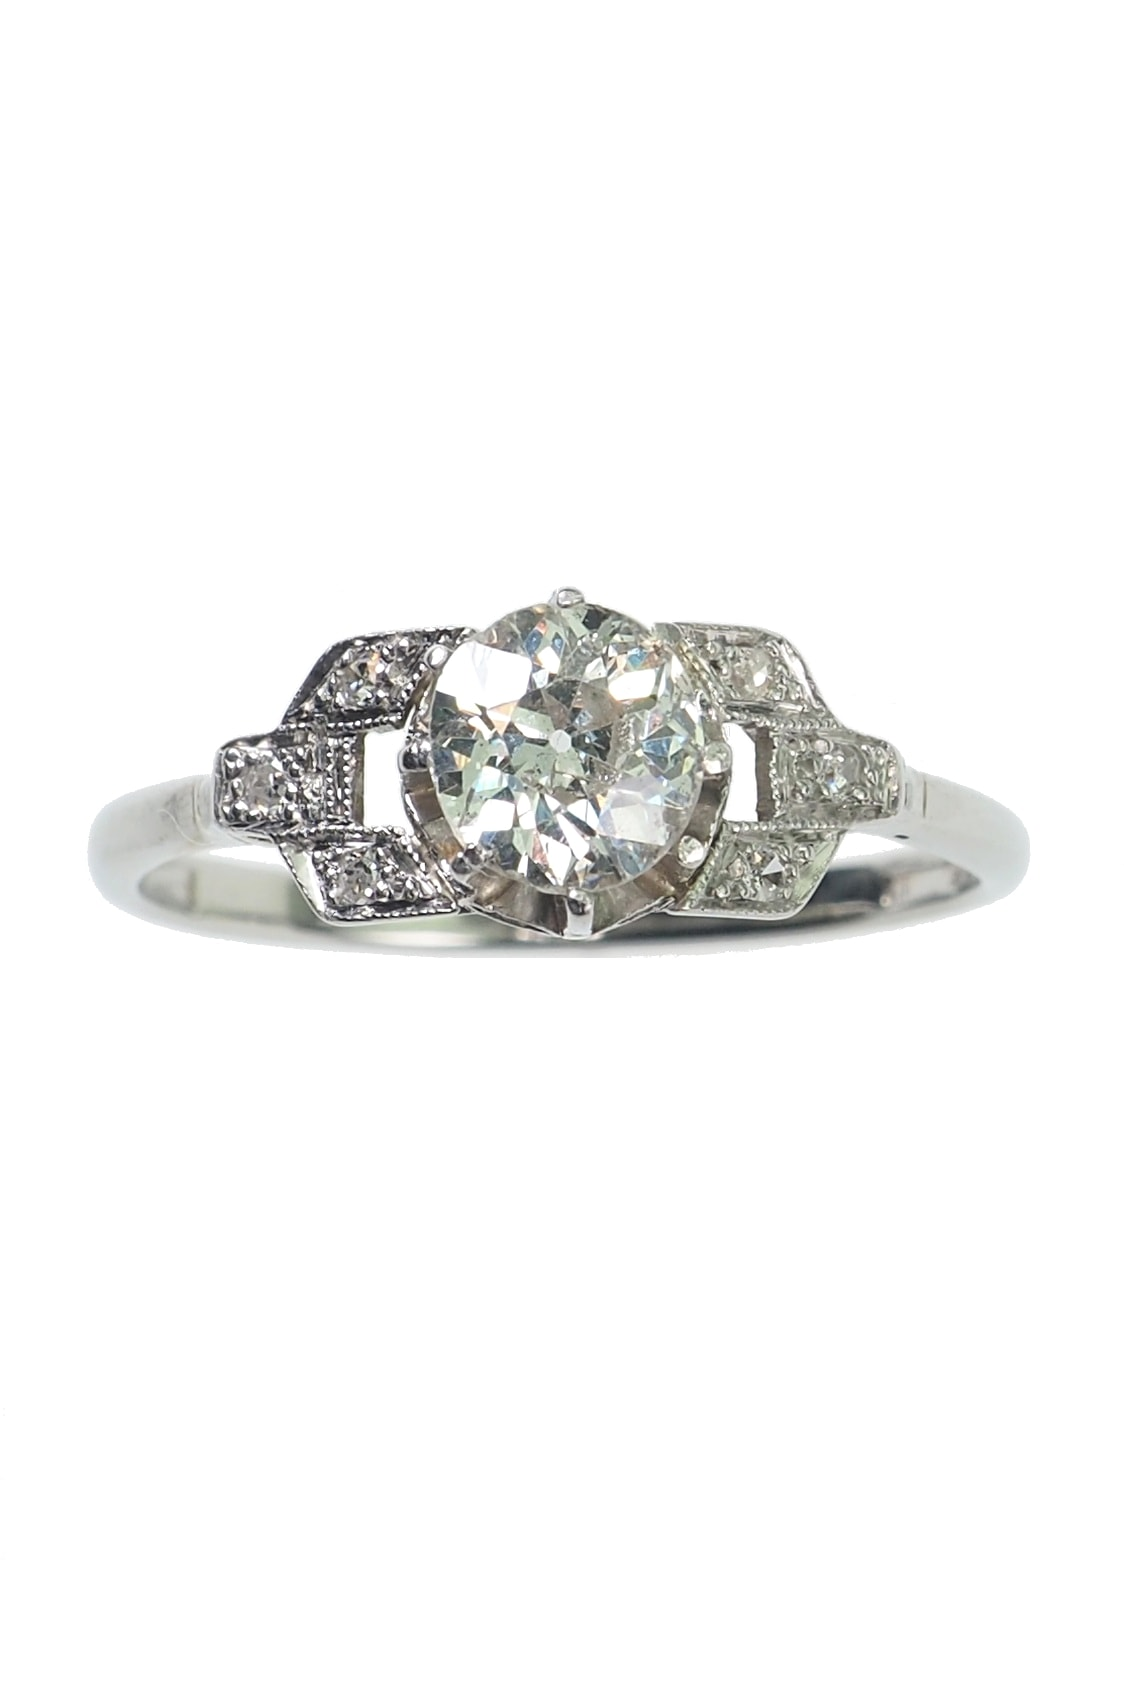 Diamantringe-Berlin-online-2341a